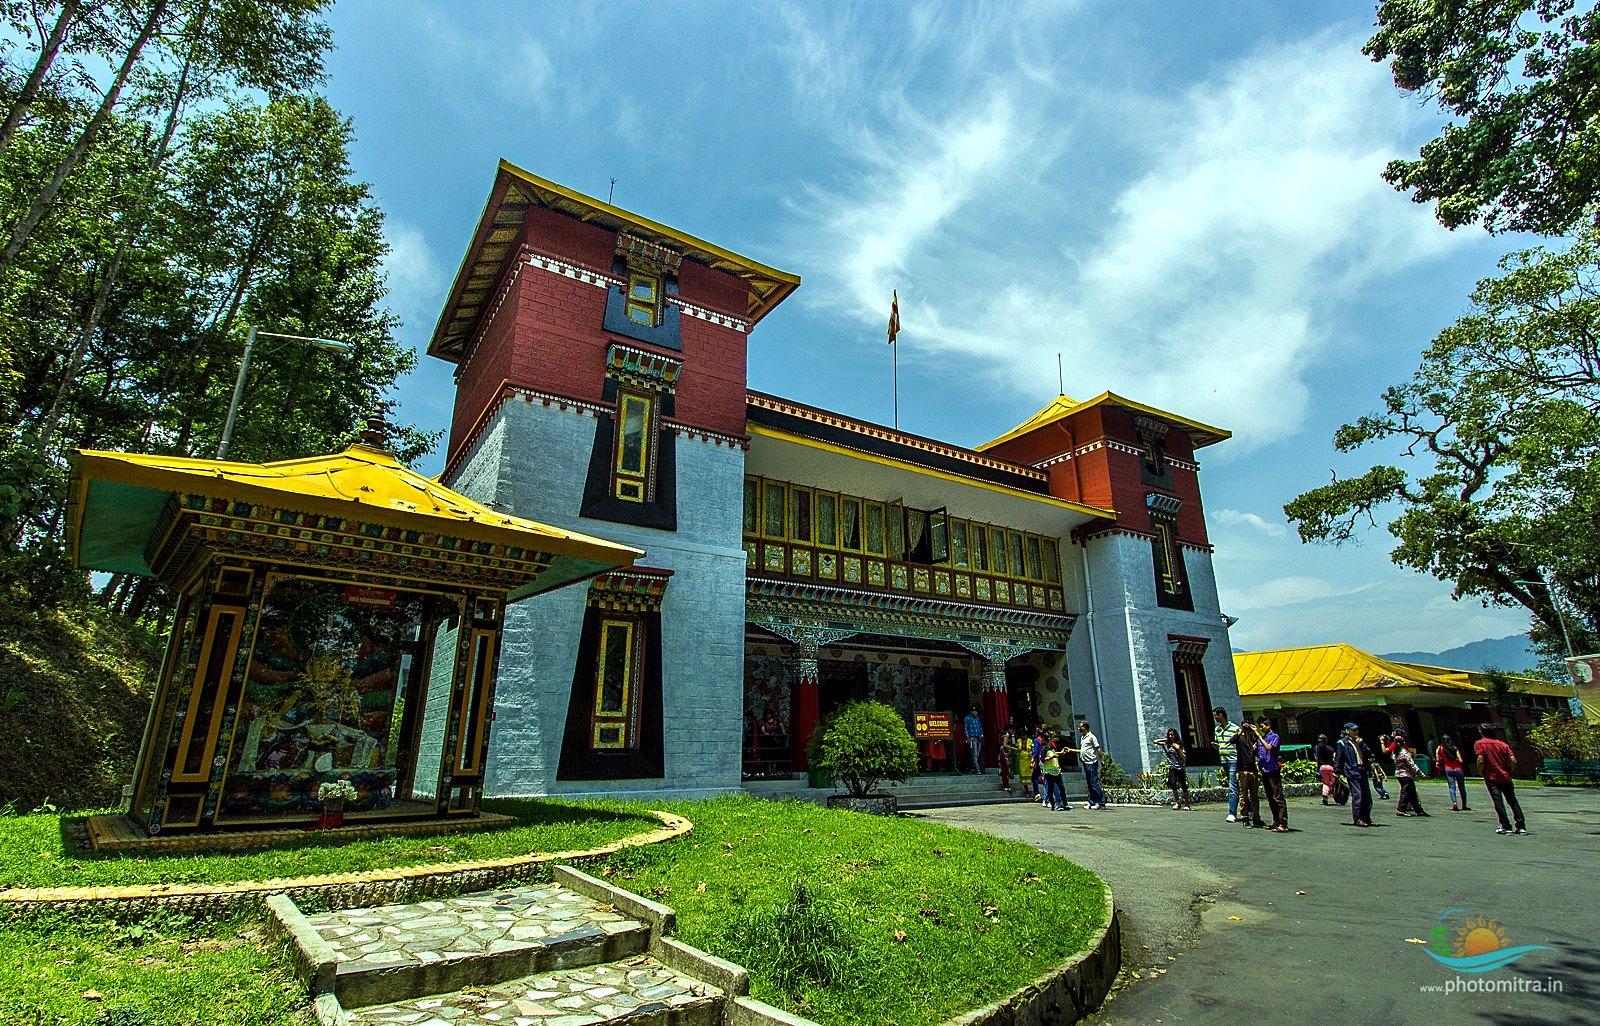 The Namgayal Institute of Technology. Photo: Amitra Kar/Flickr